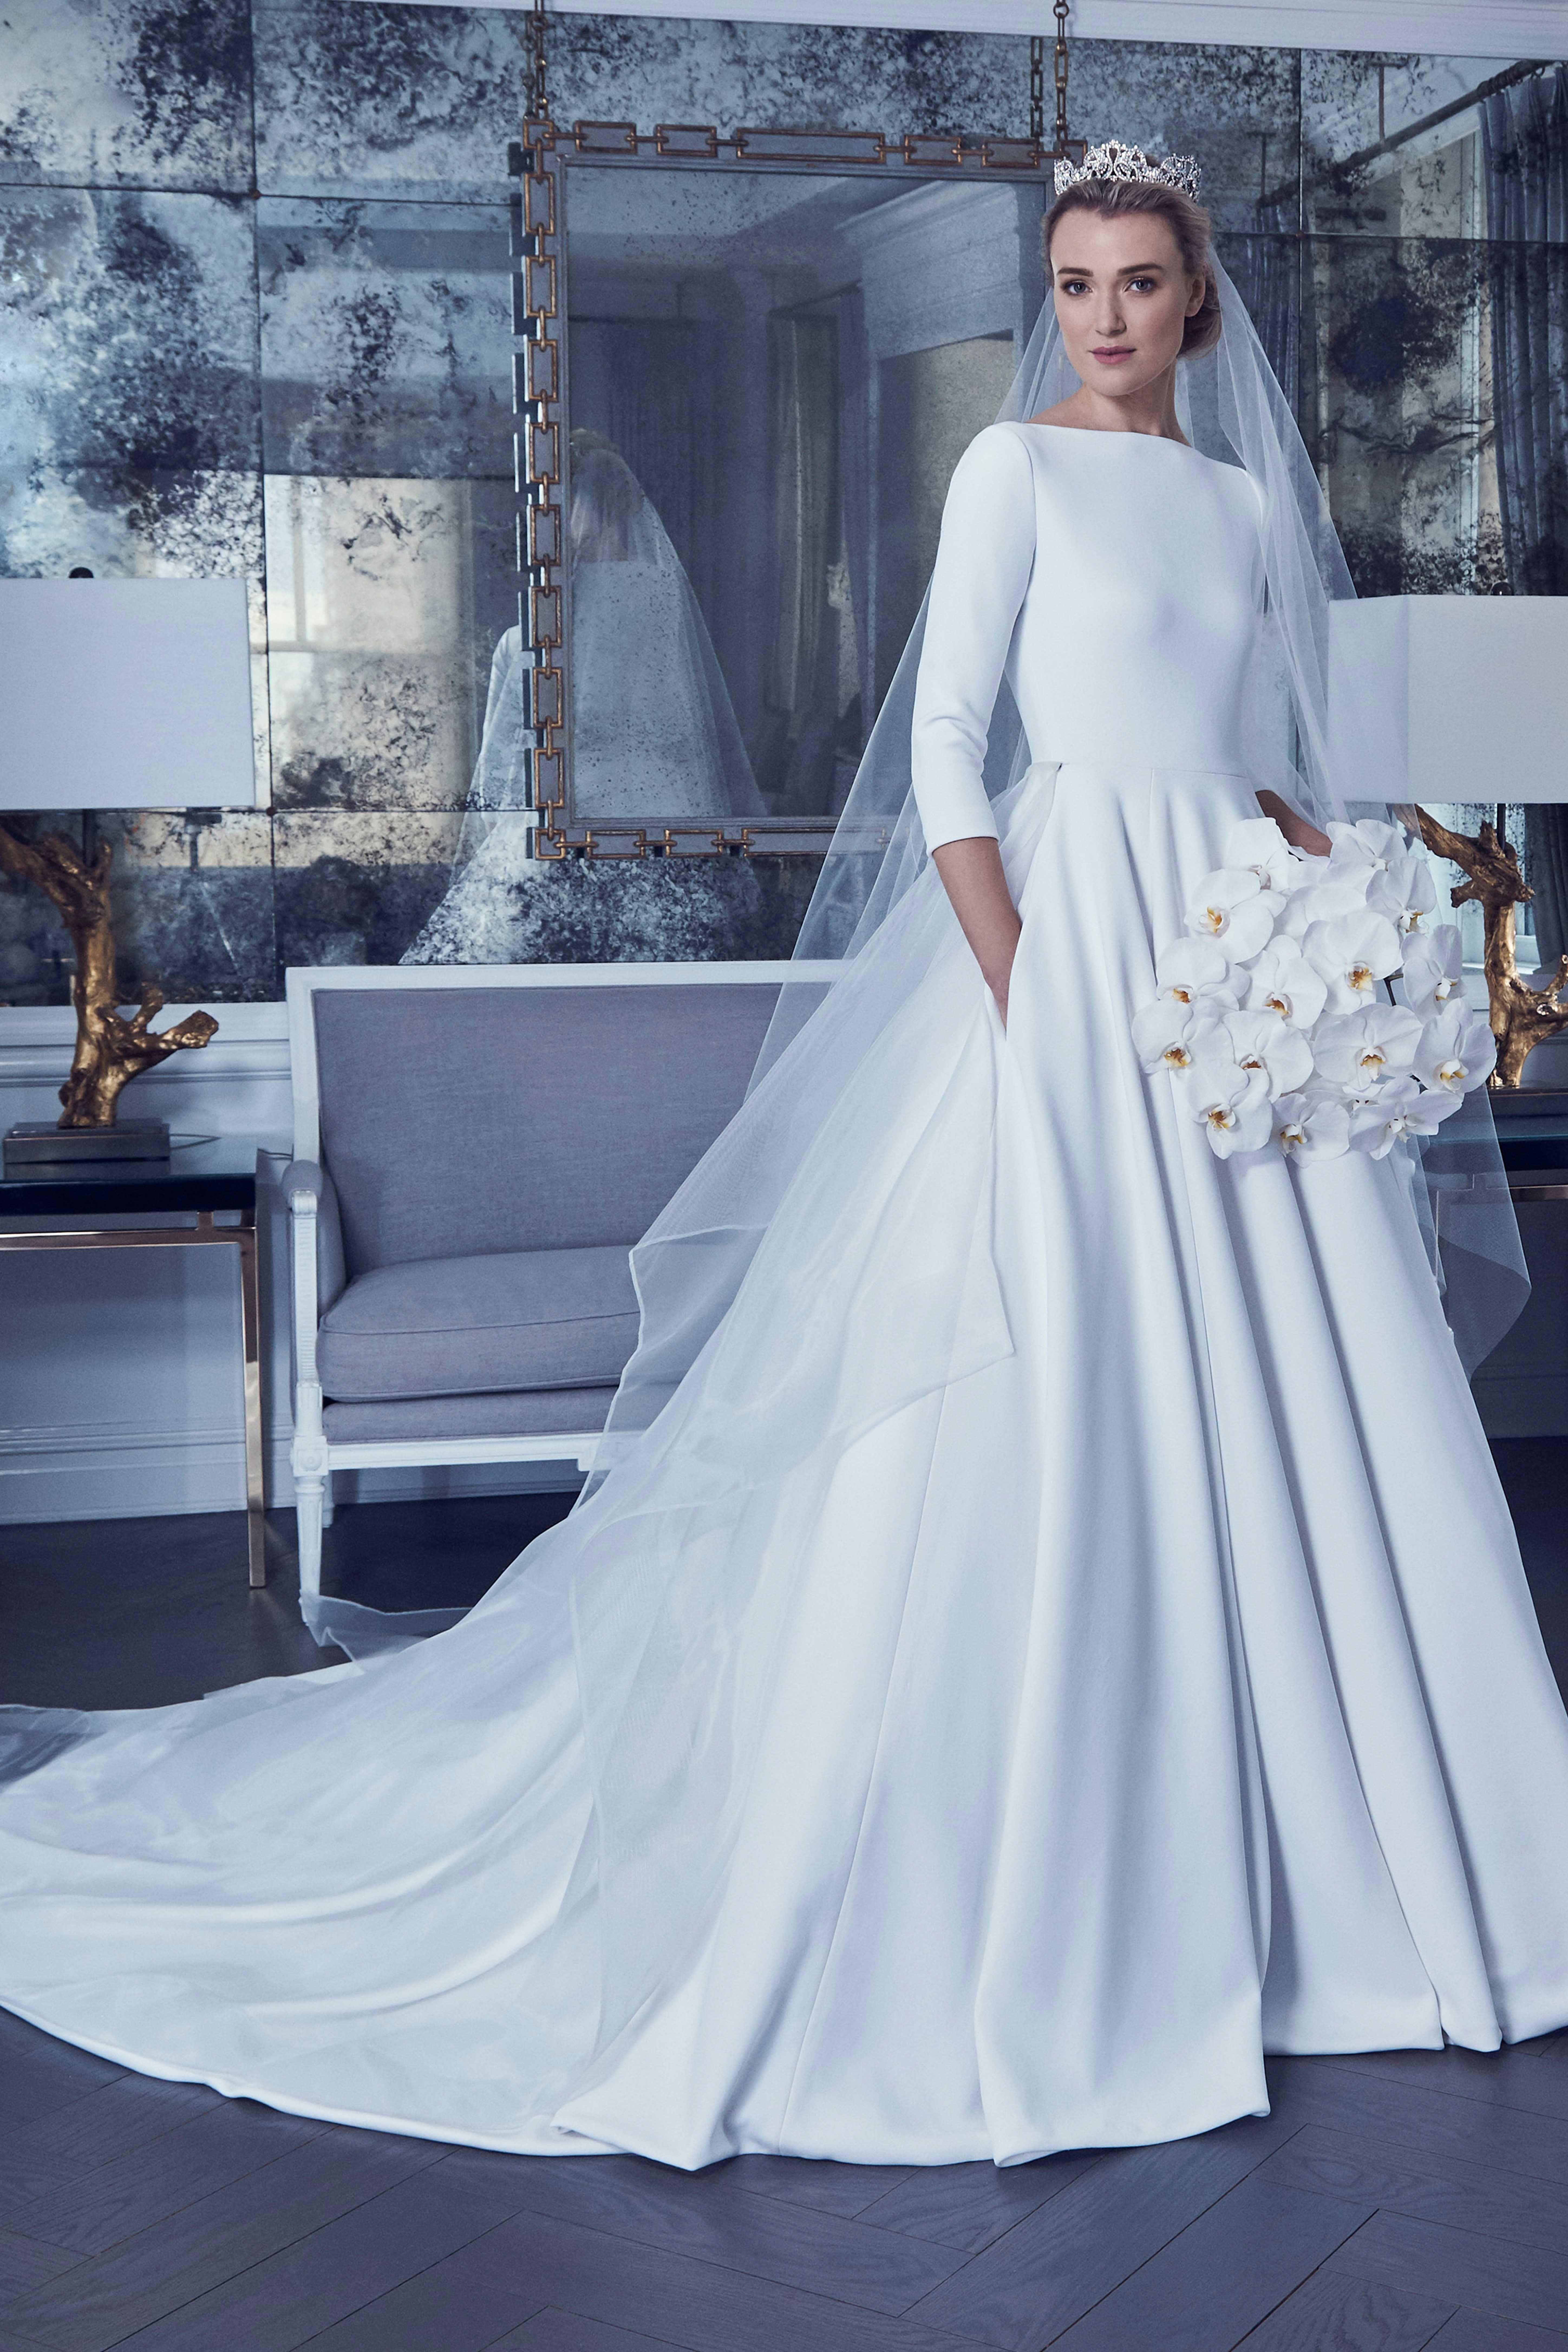 2d8f0d94b4 Romona Keveža Bridal & Wedding Dress Collection Spring 2019 | Brides ...